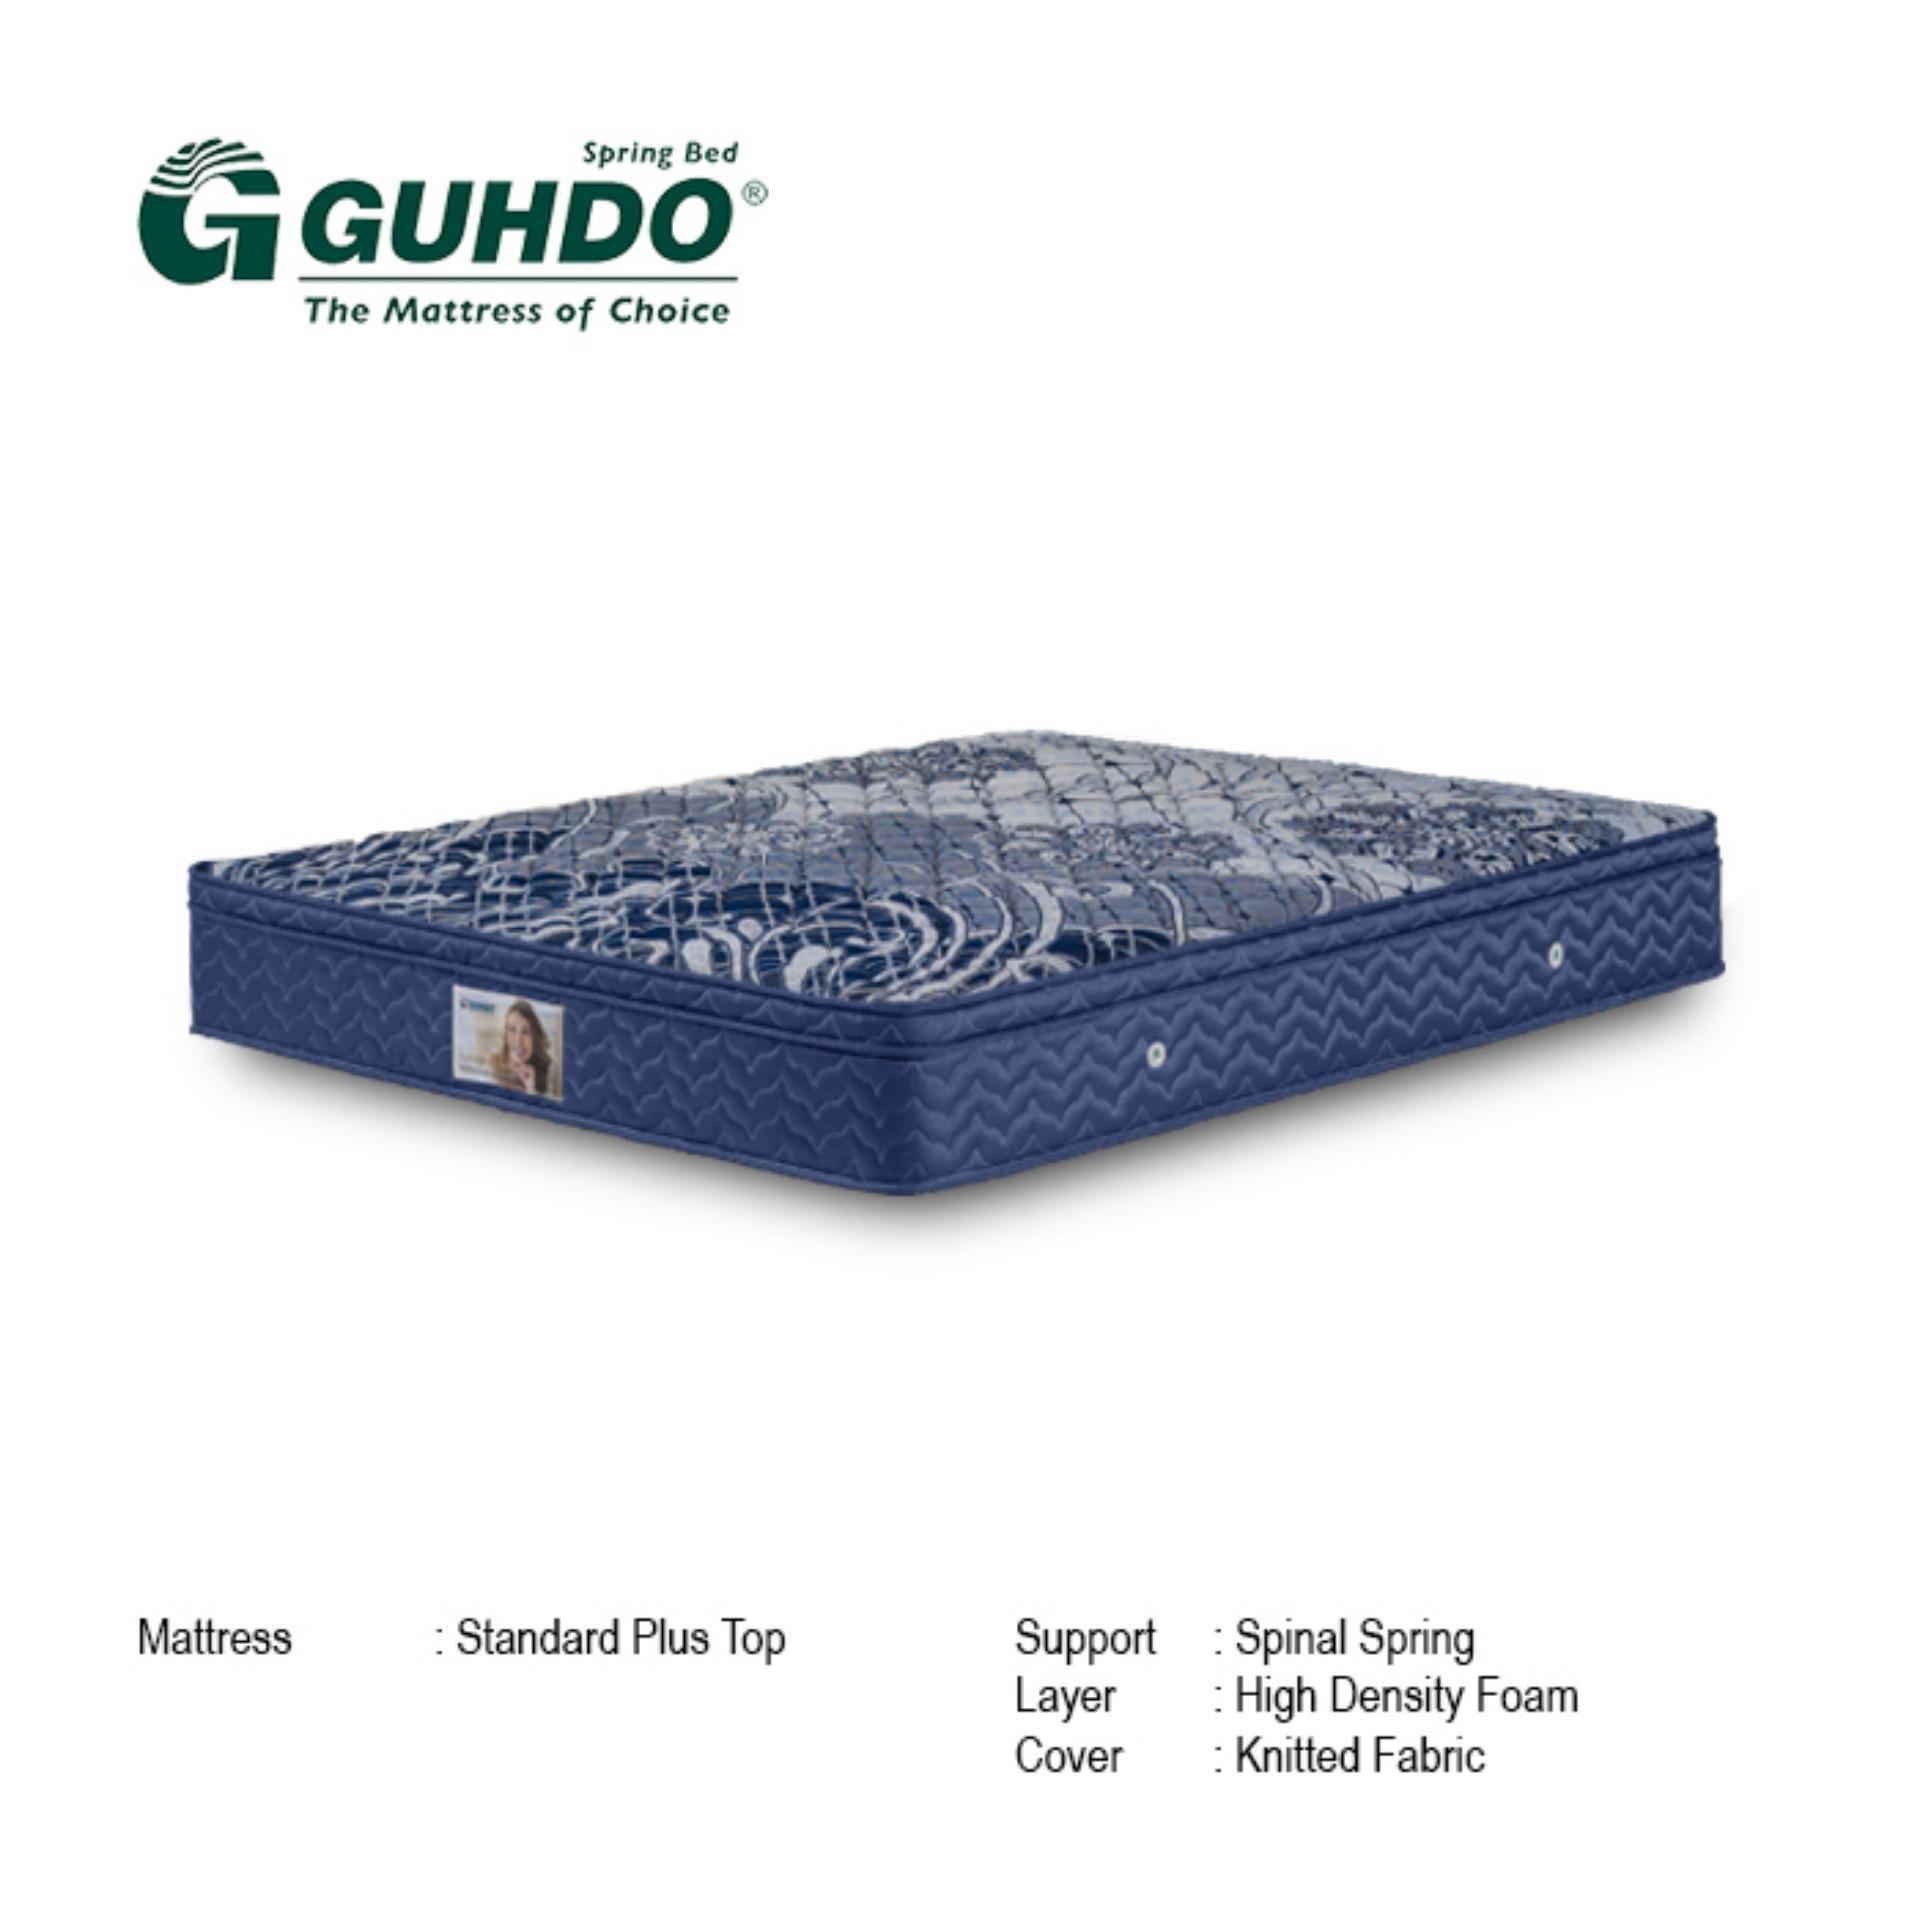 Guhdo Springbed Standard Single Plush Top Biru Ketebalan 27 Cm Size 180 x 200 - Mattress